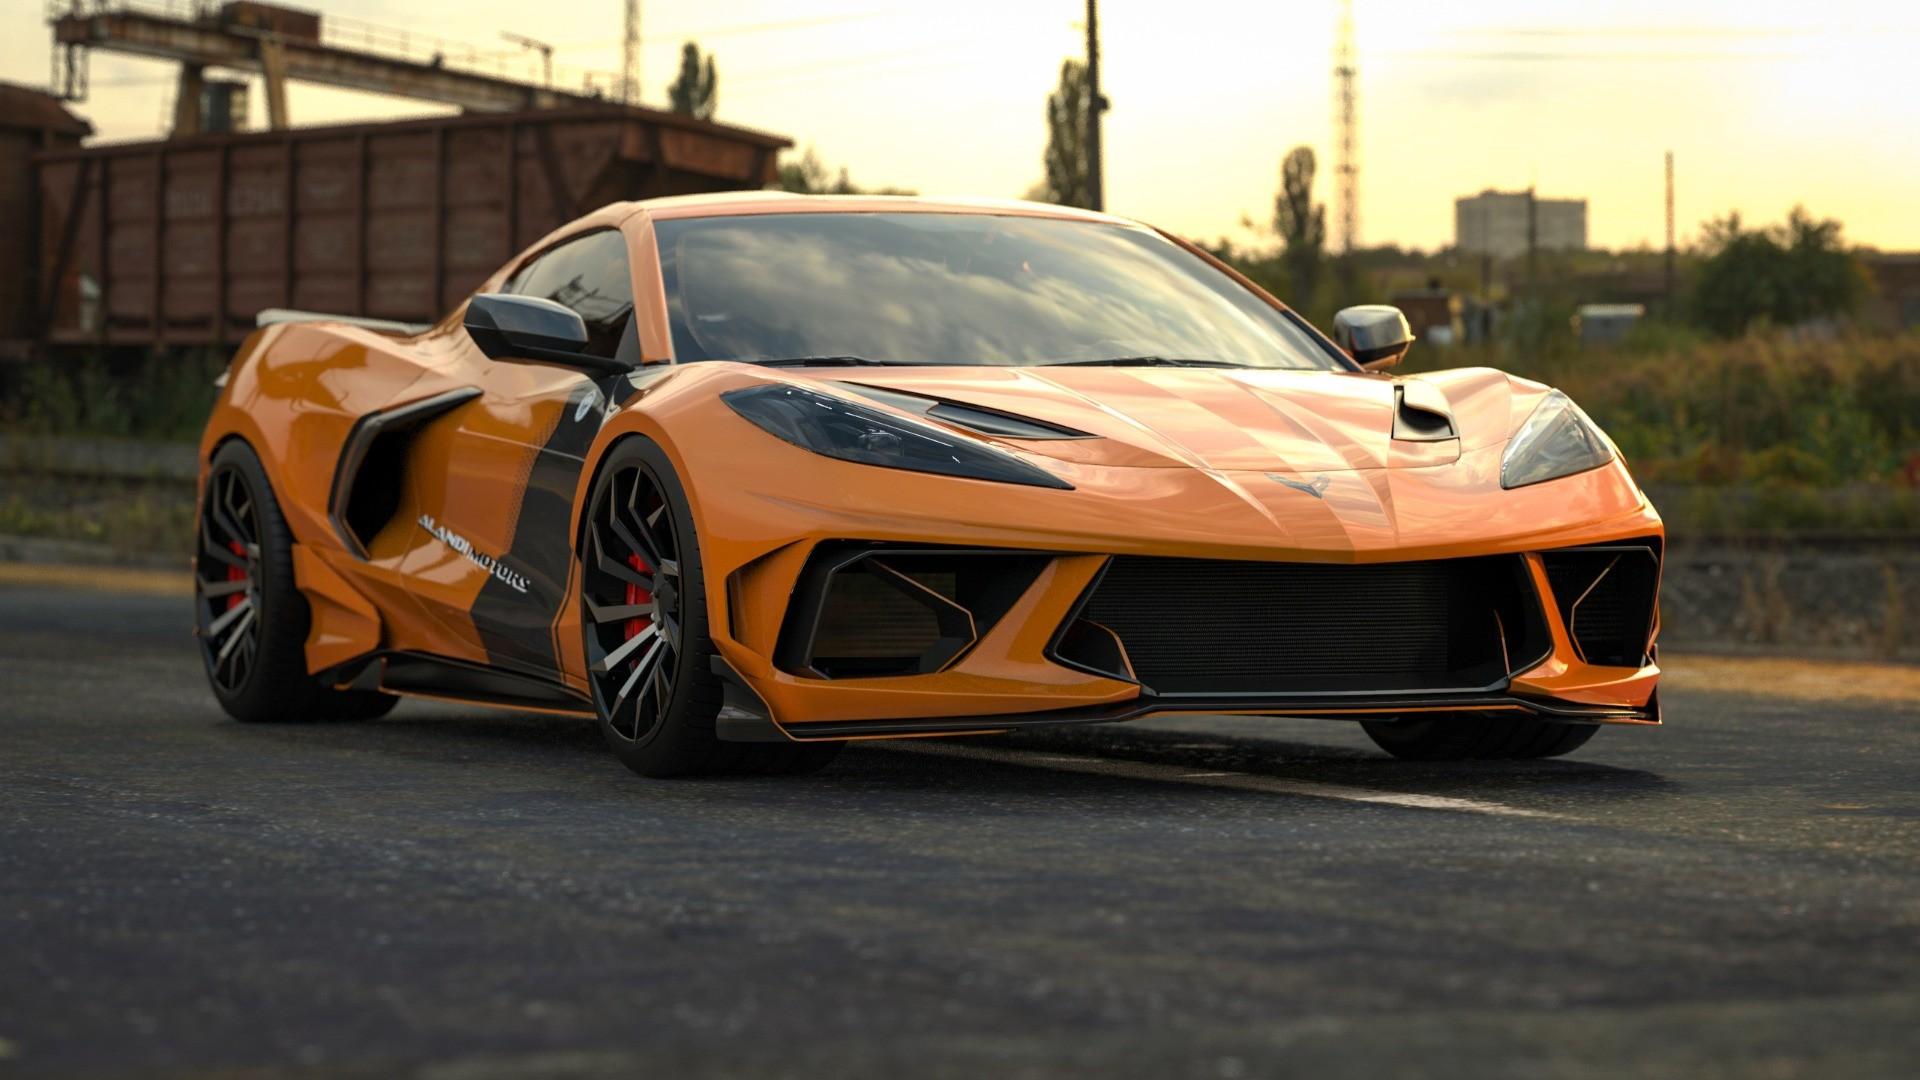 Chevrolet-Corvette-Centurion-by-Alandi-Motors-16